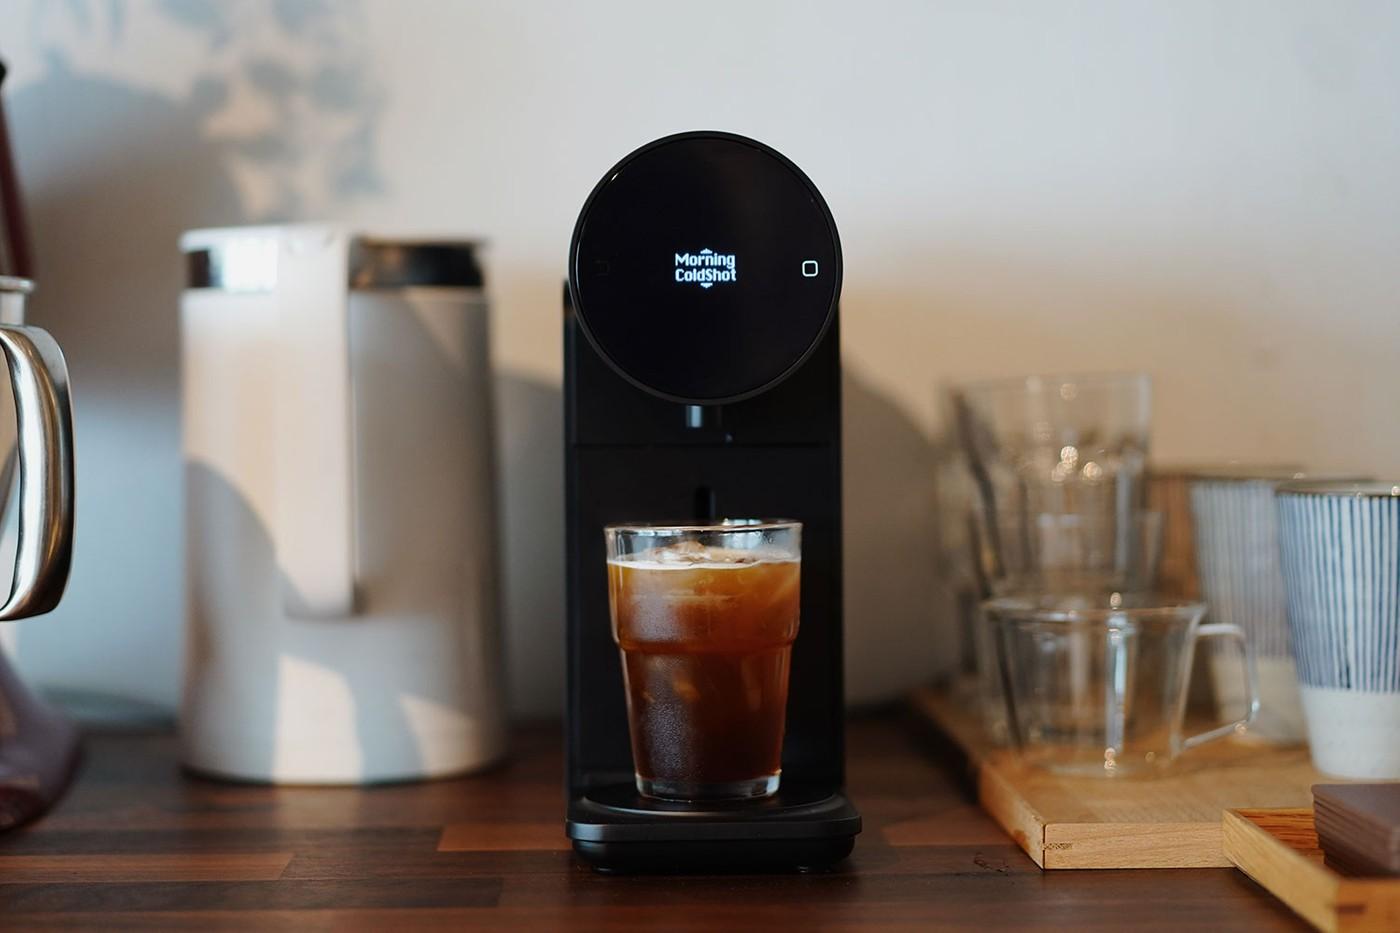 The Morning Machine una cafetera inteligente te hará lucir como todo un barista